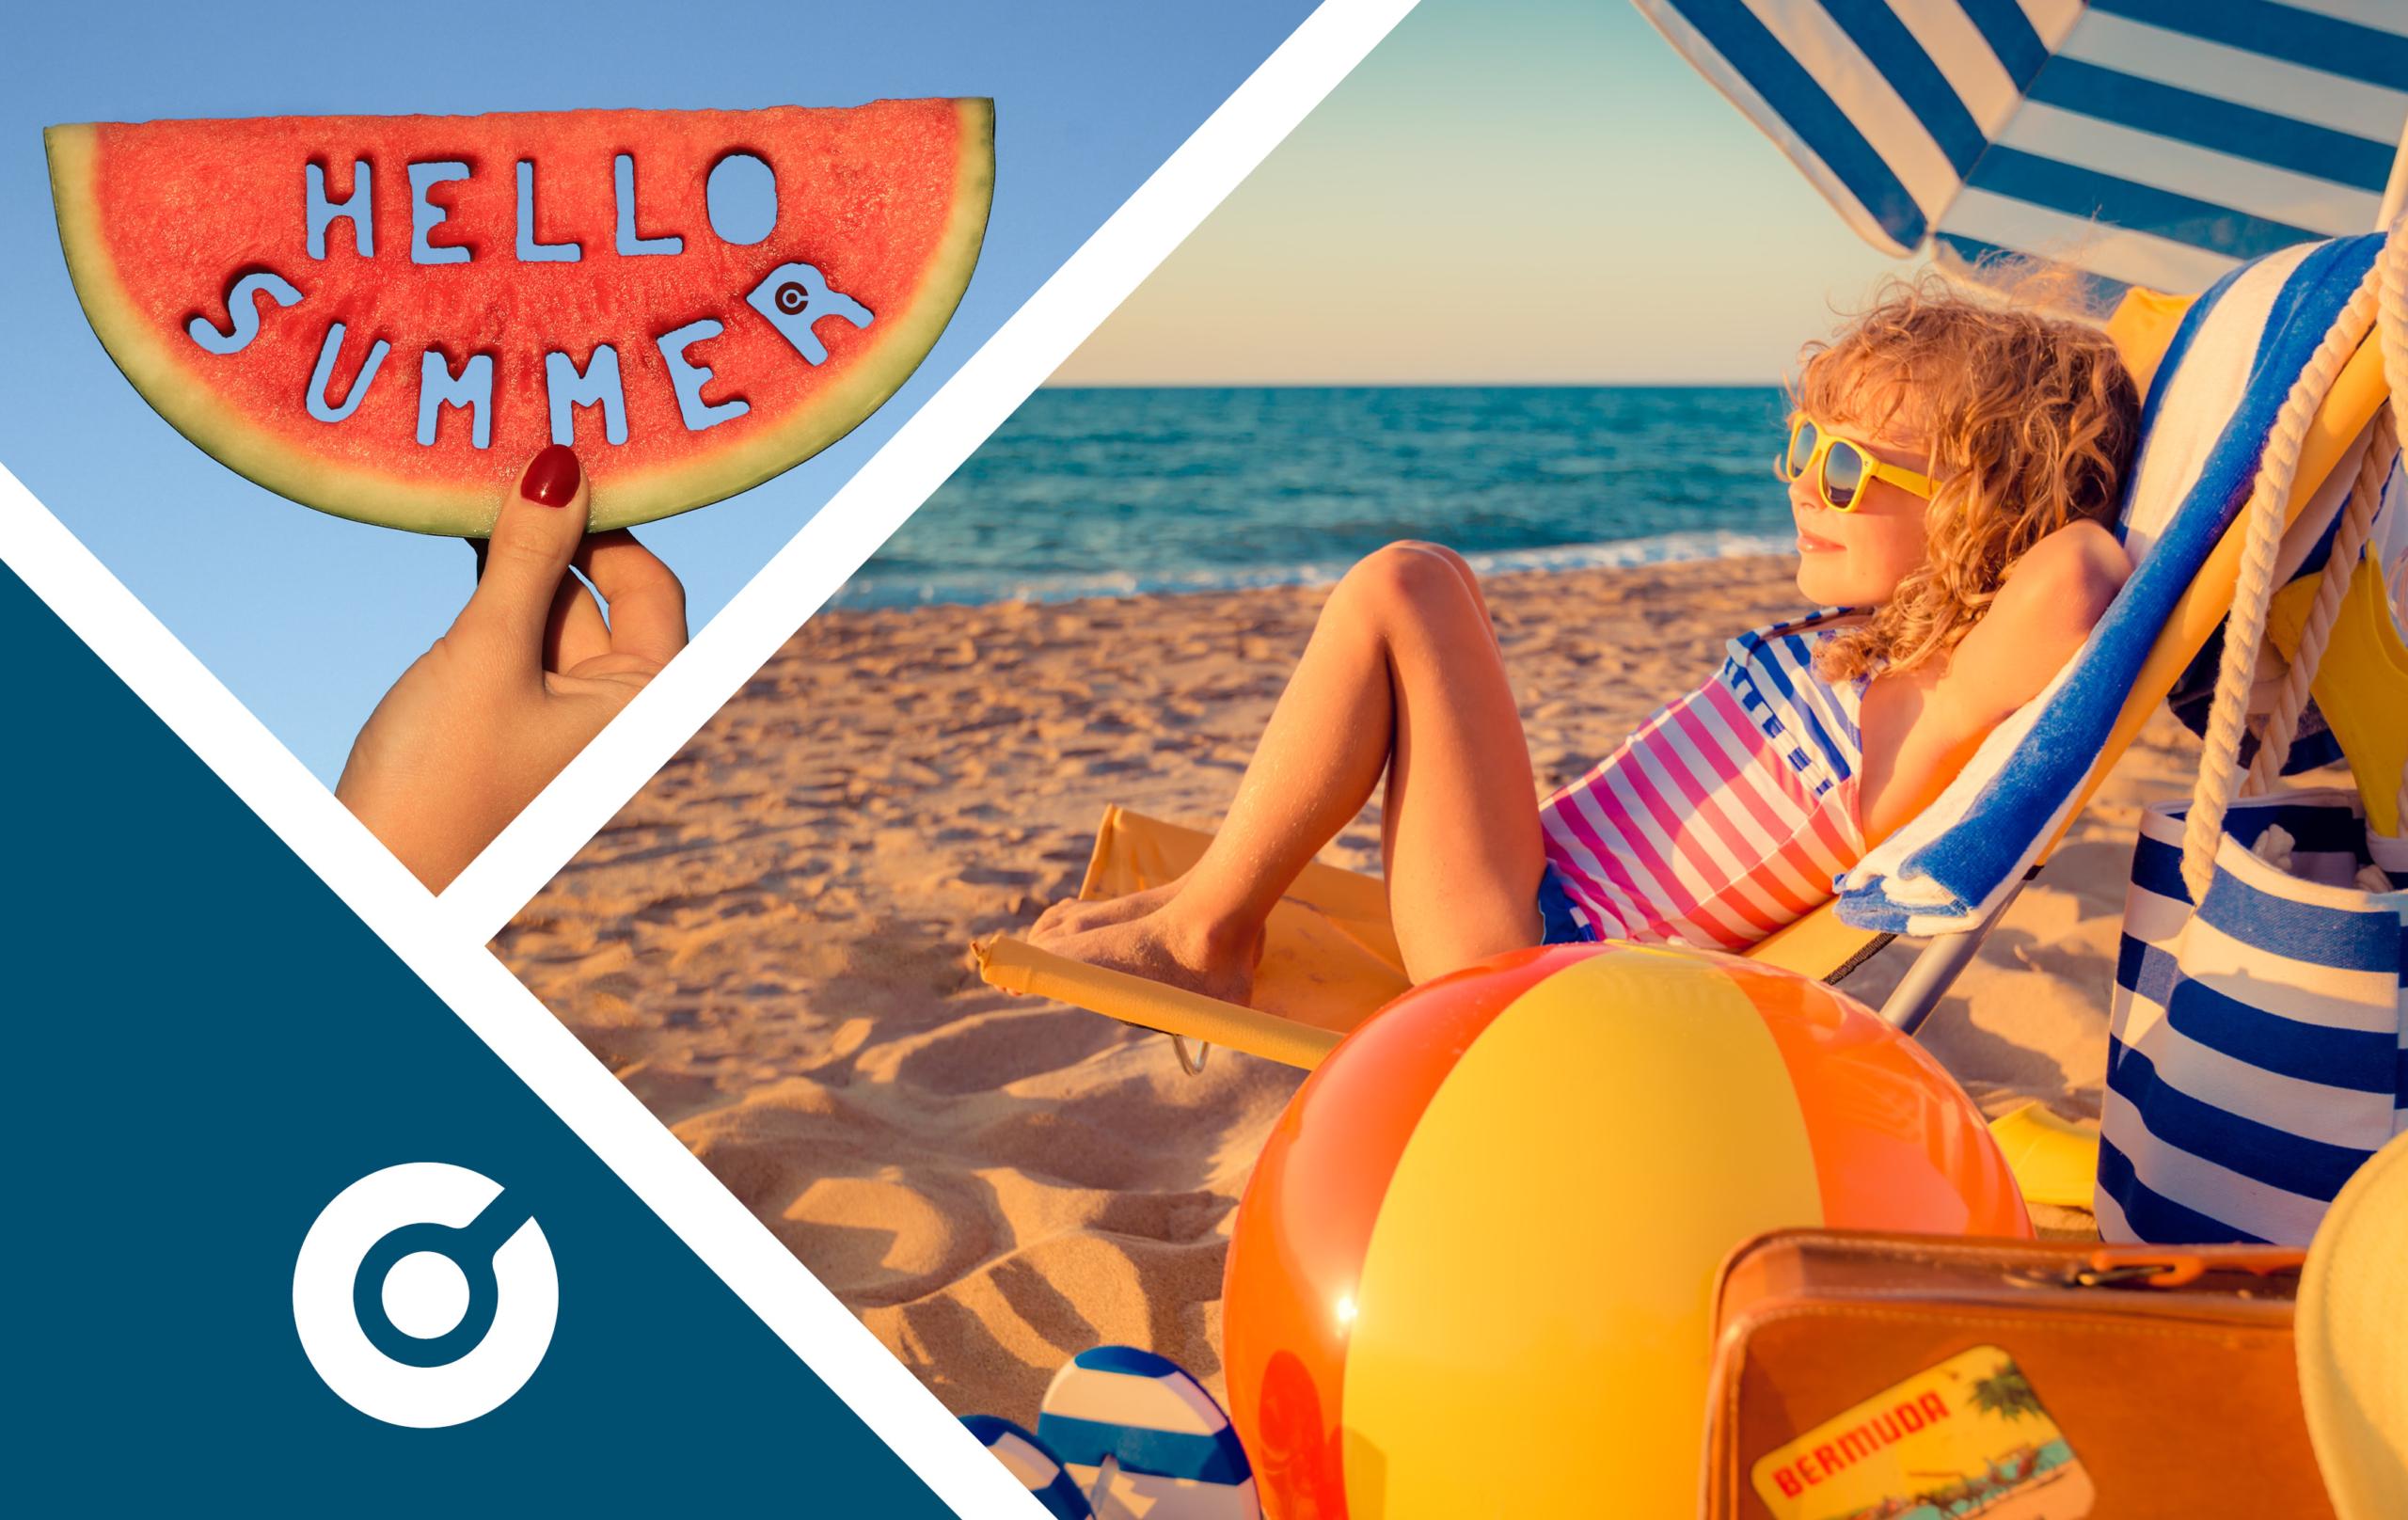 CORE-emt summer greeting 2021